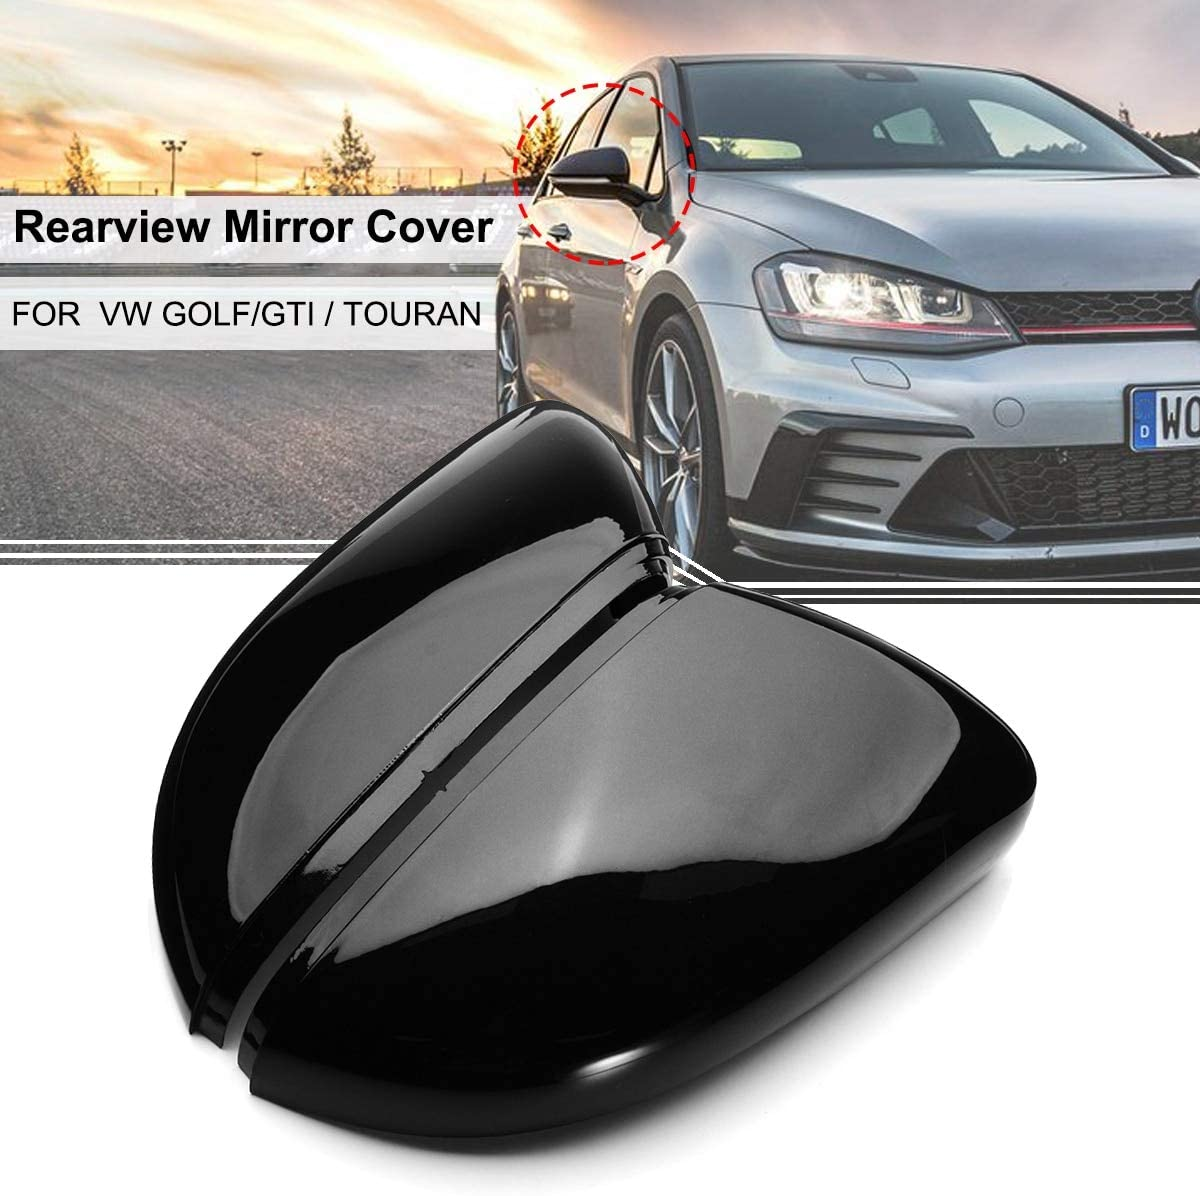 A Pair Wing Rear View Mirror Case Cover Trim Cap For Vw Golf Gti Mk6 Touran Amazon Com